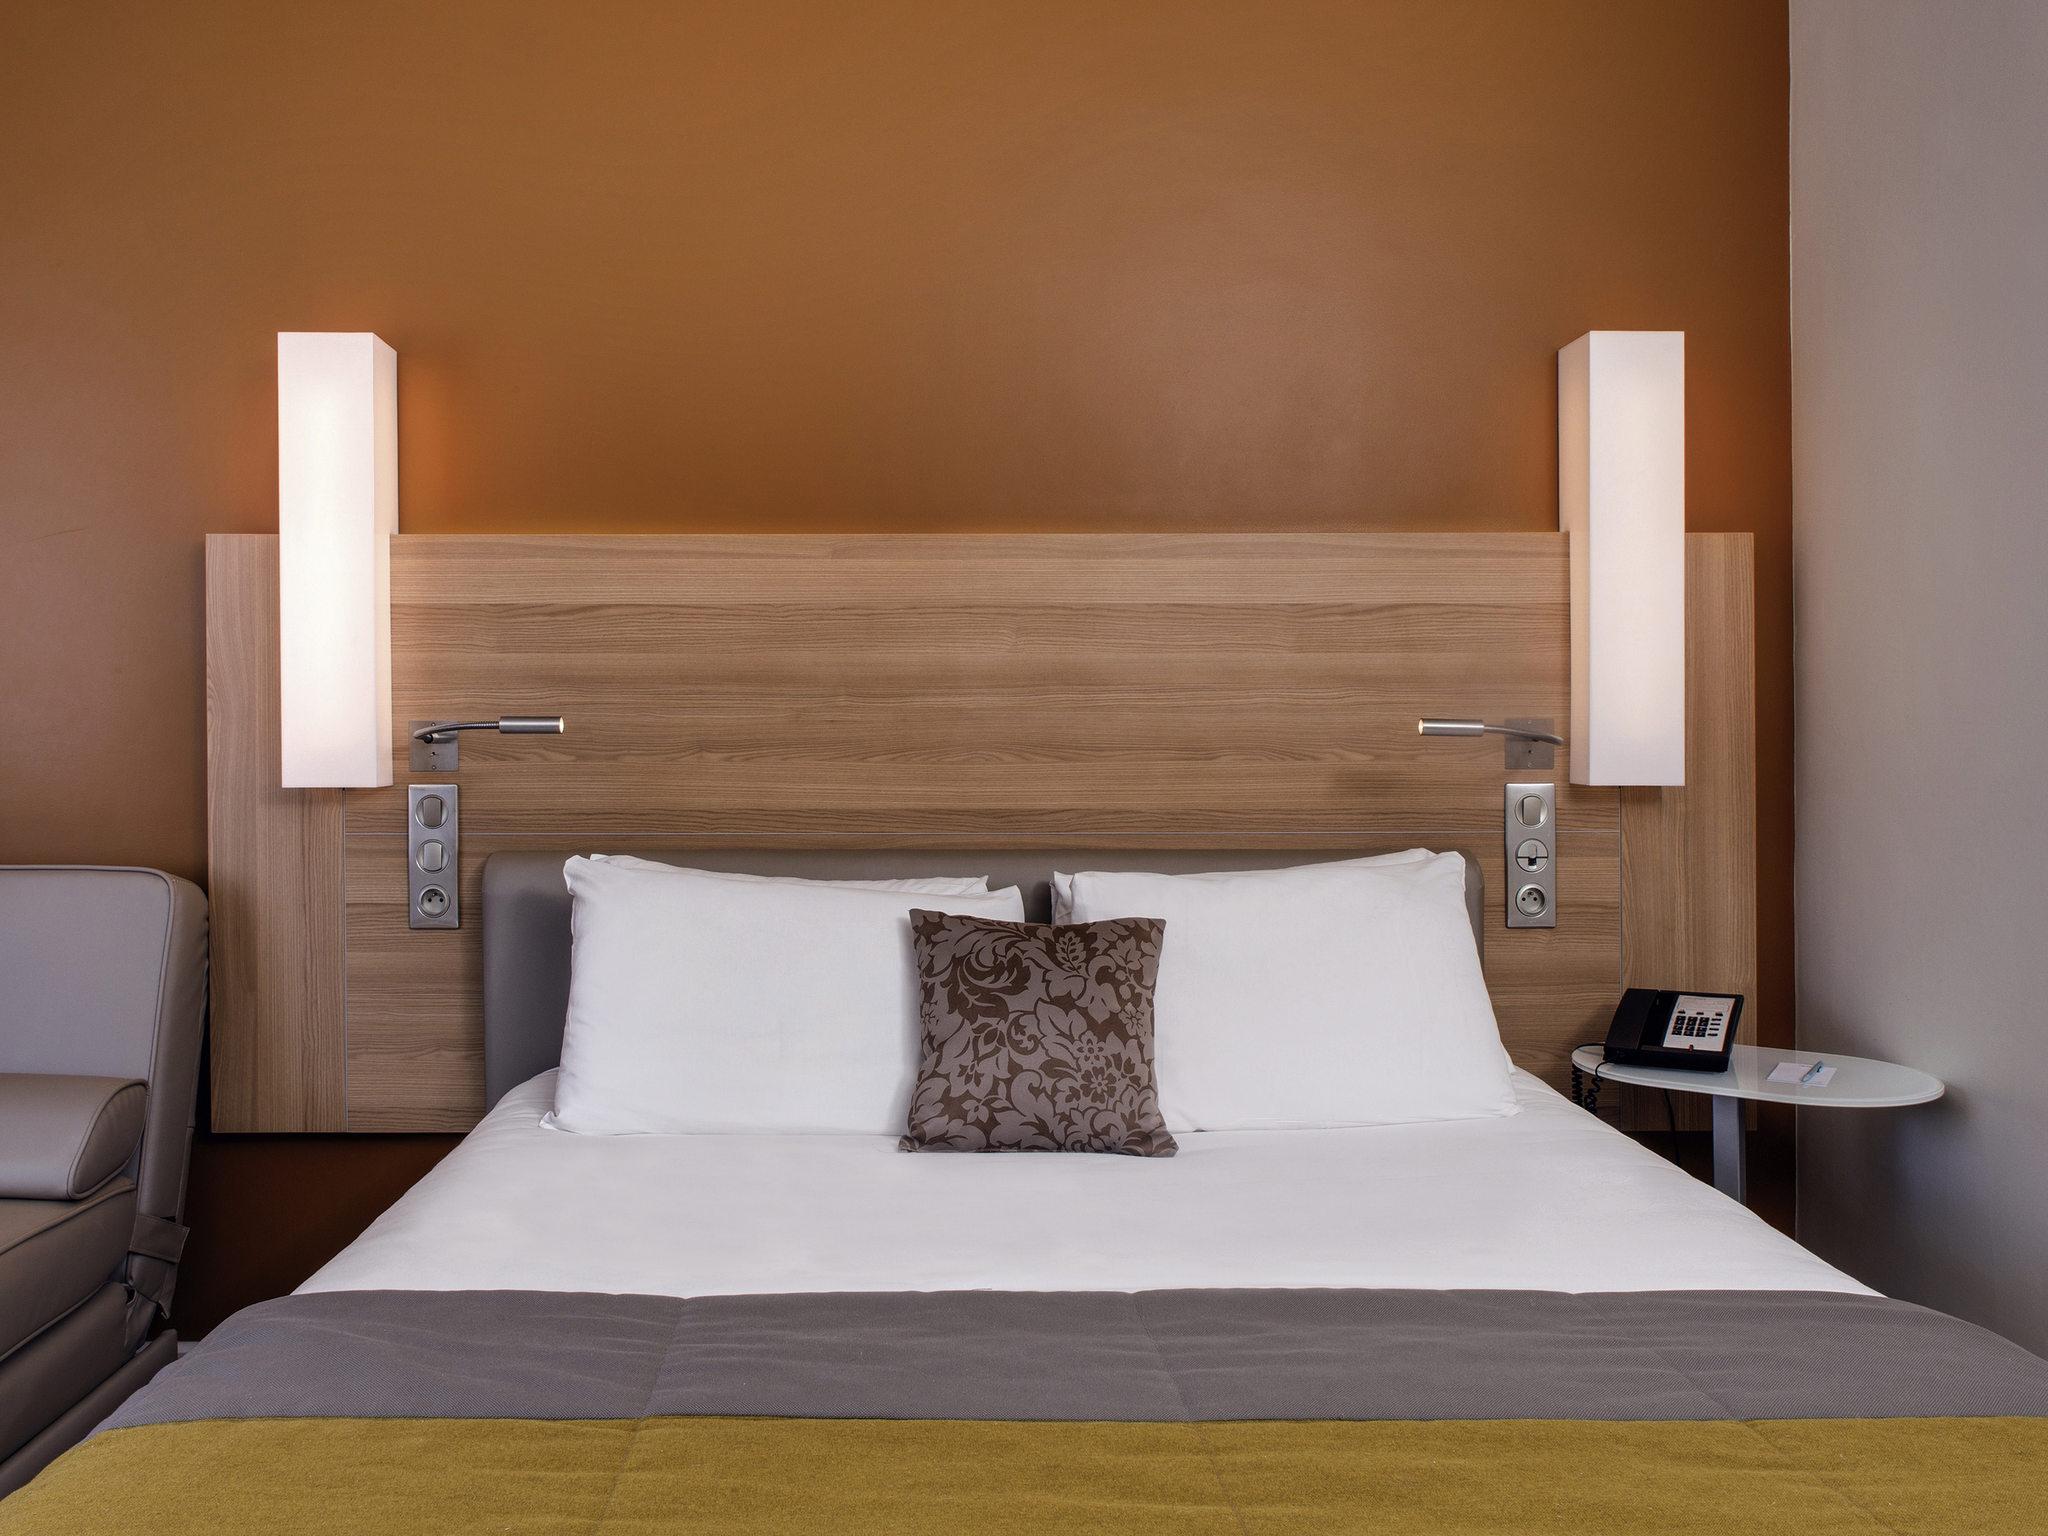 Hôtel - Hôtel Mercure Mâcon Bord de Saône